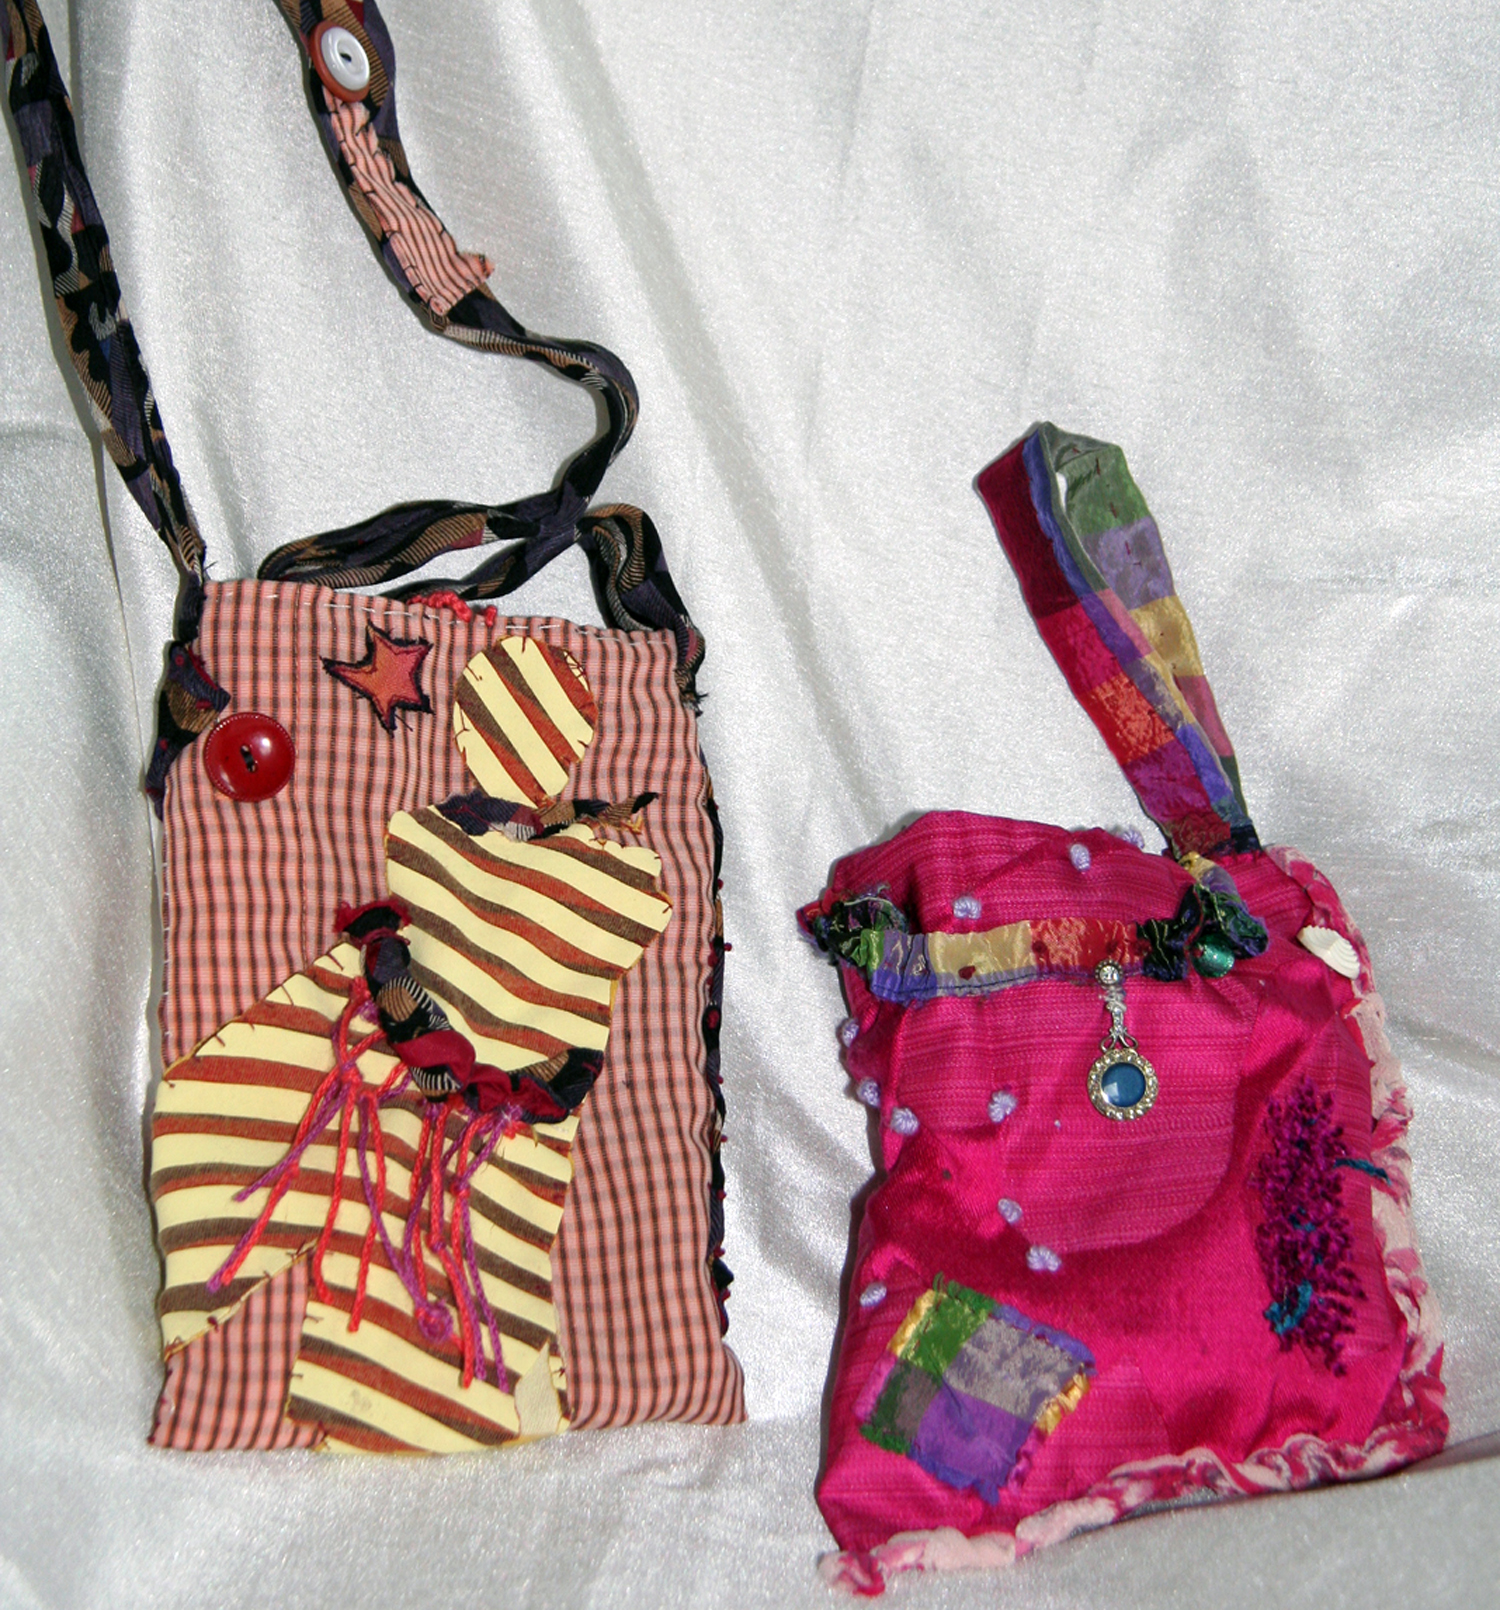 PIZAZZ BAGS ~ Repurposed textile